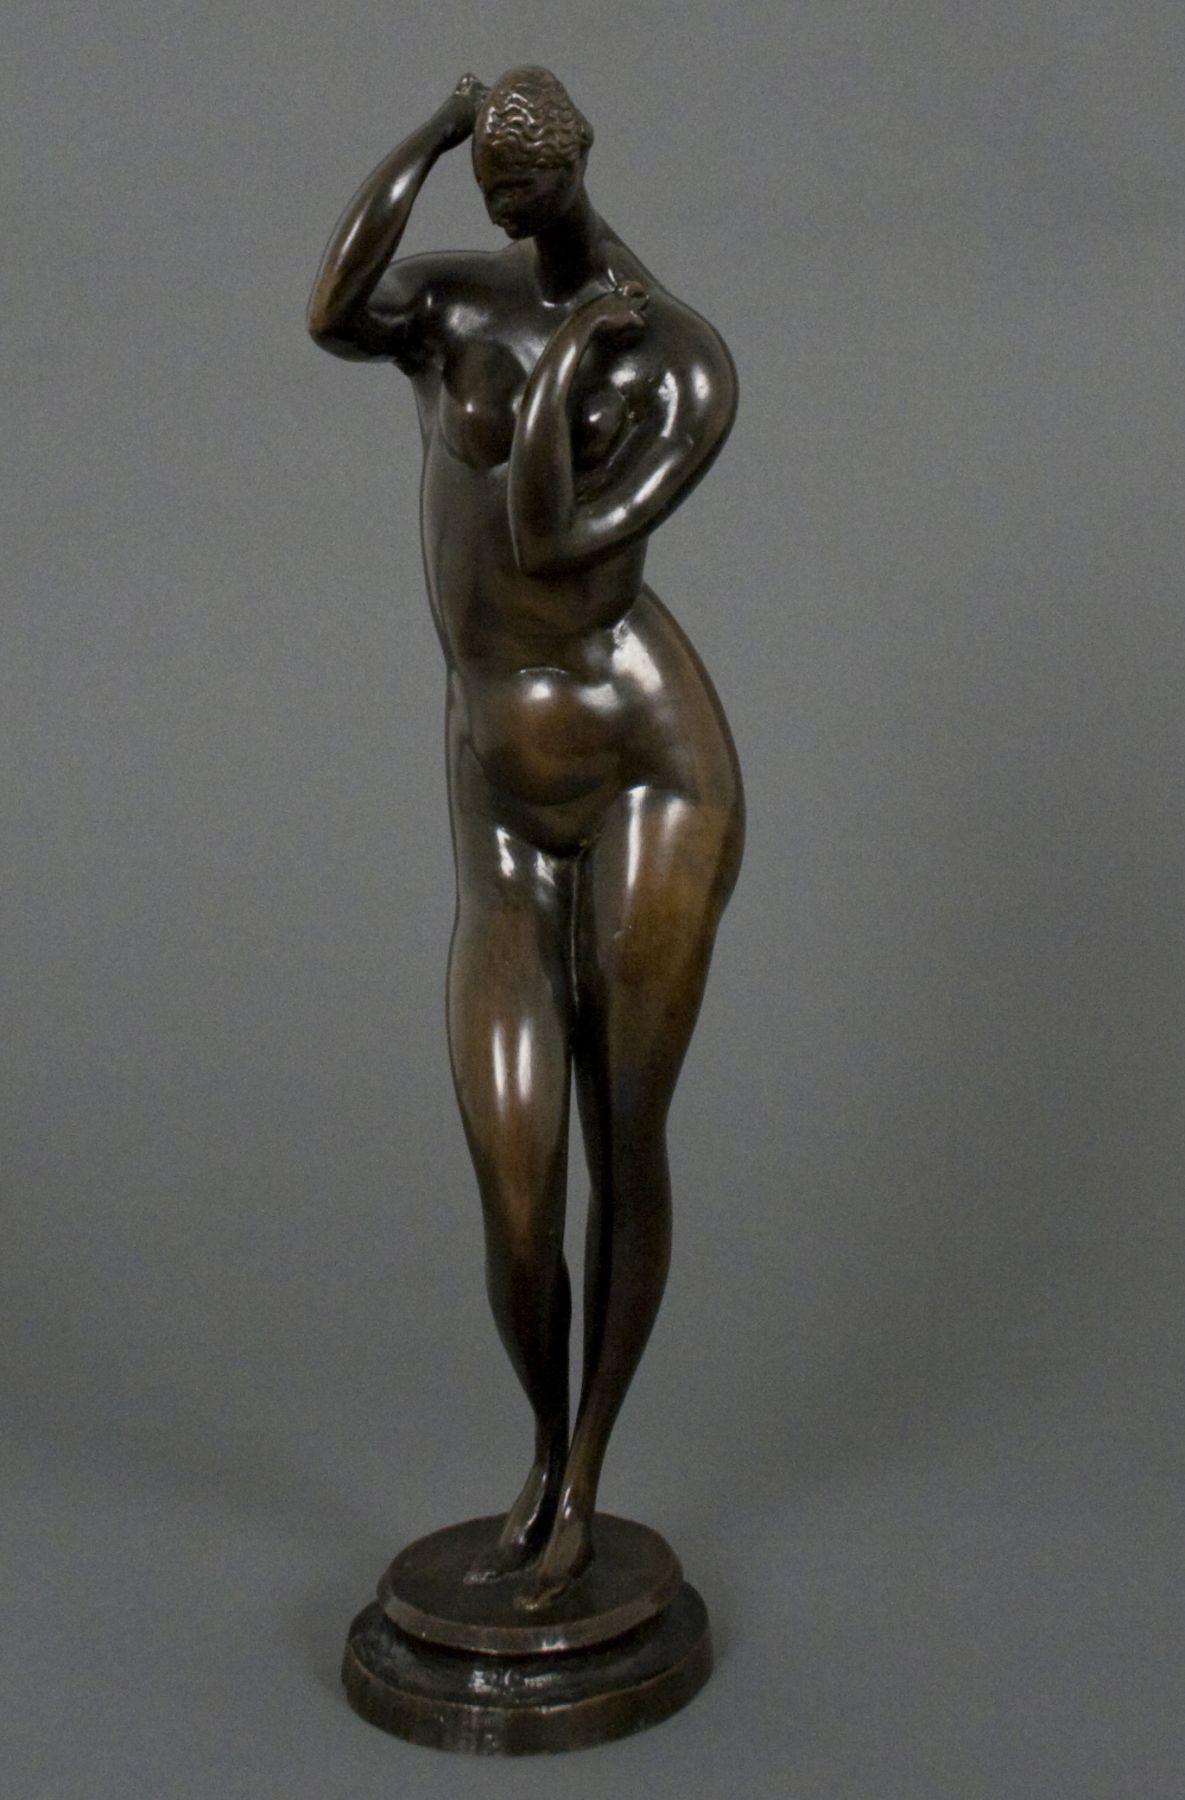 Elie Nadelman, Standing Female Nude, c. 1909-1915, bronze, 15 x 5 1/4 x 4 inches